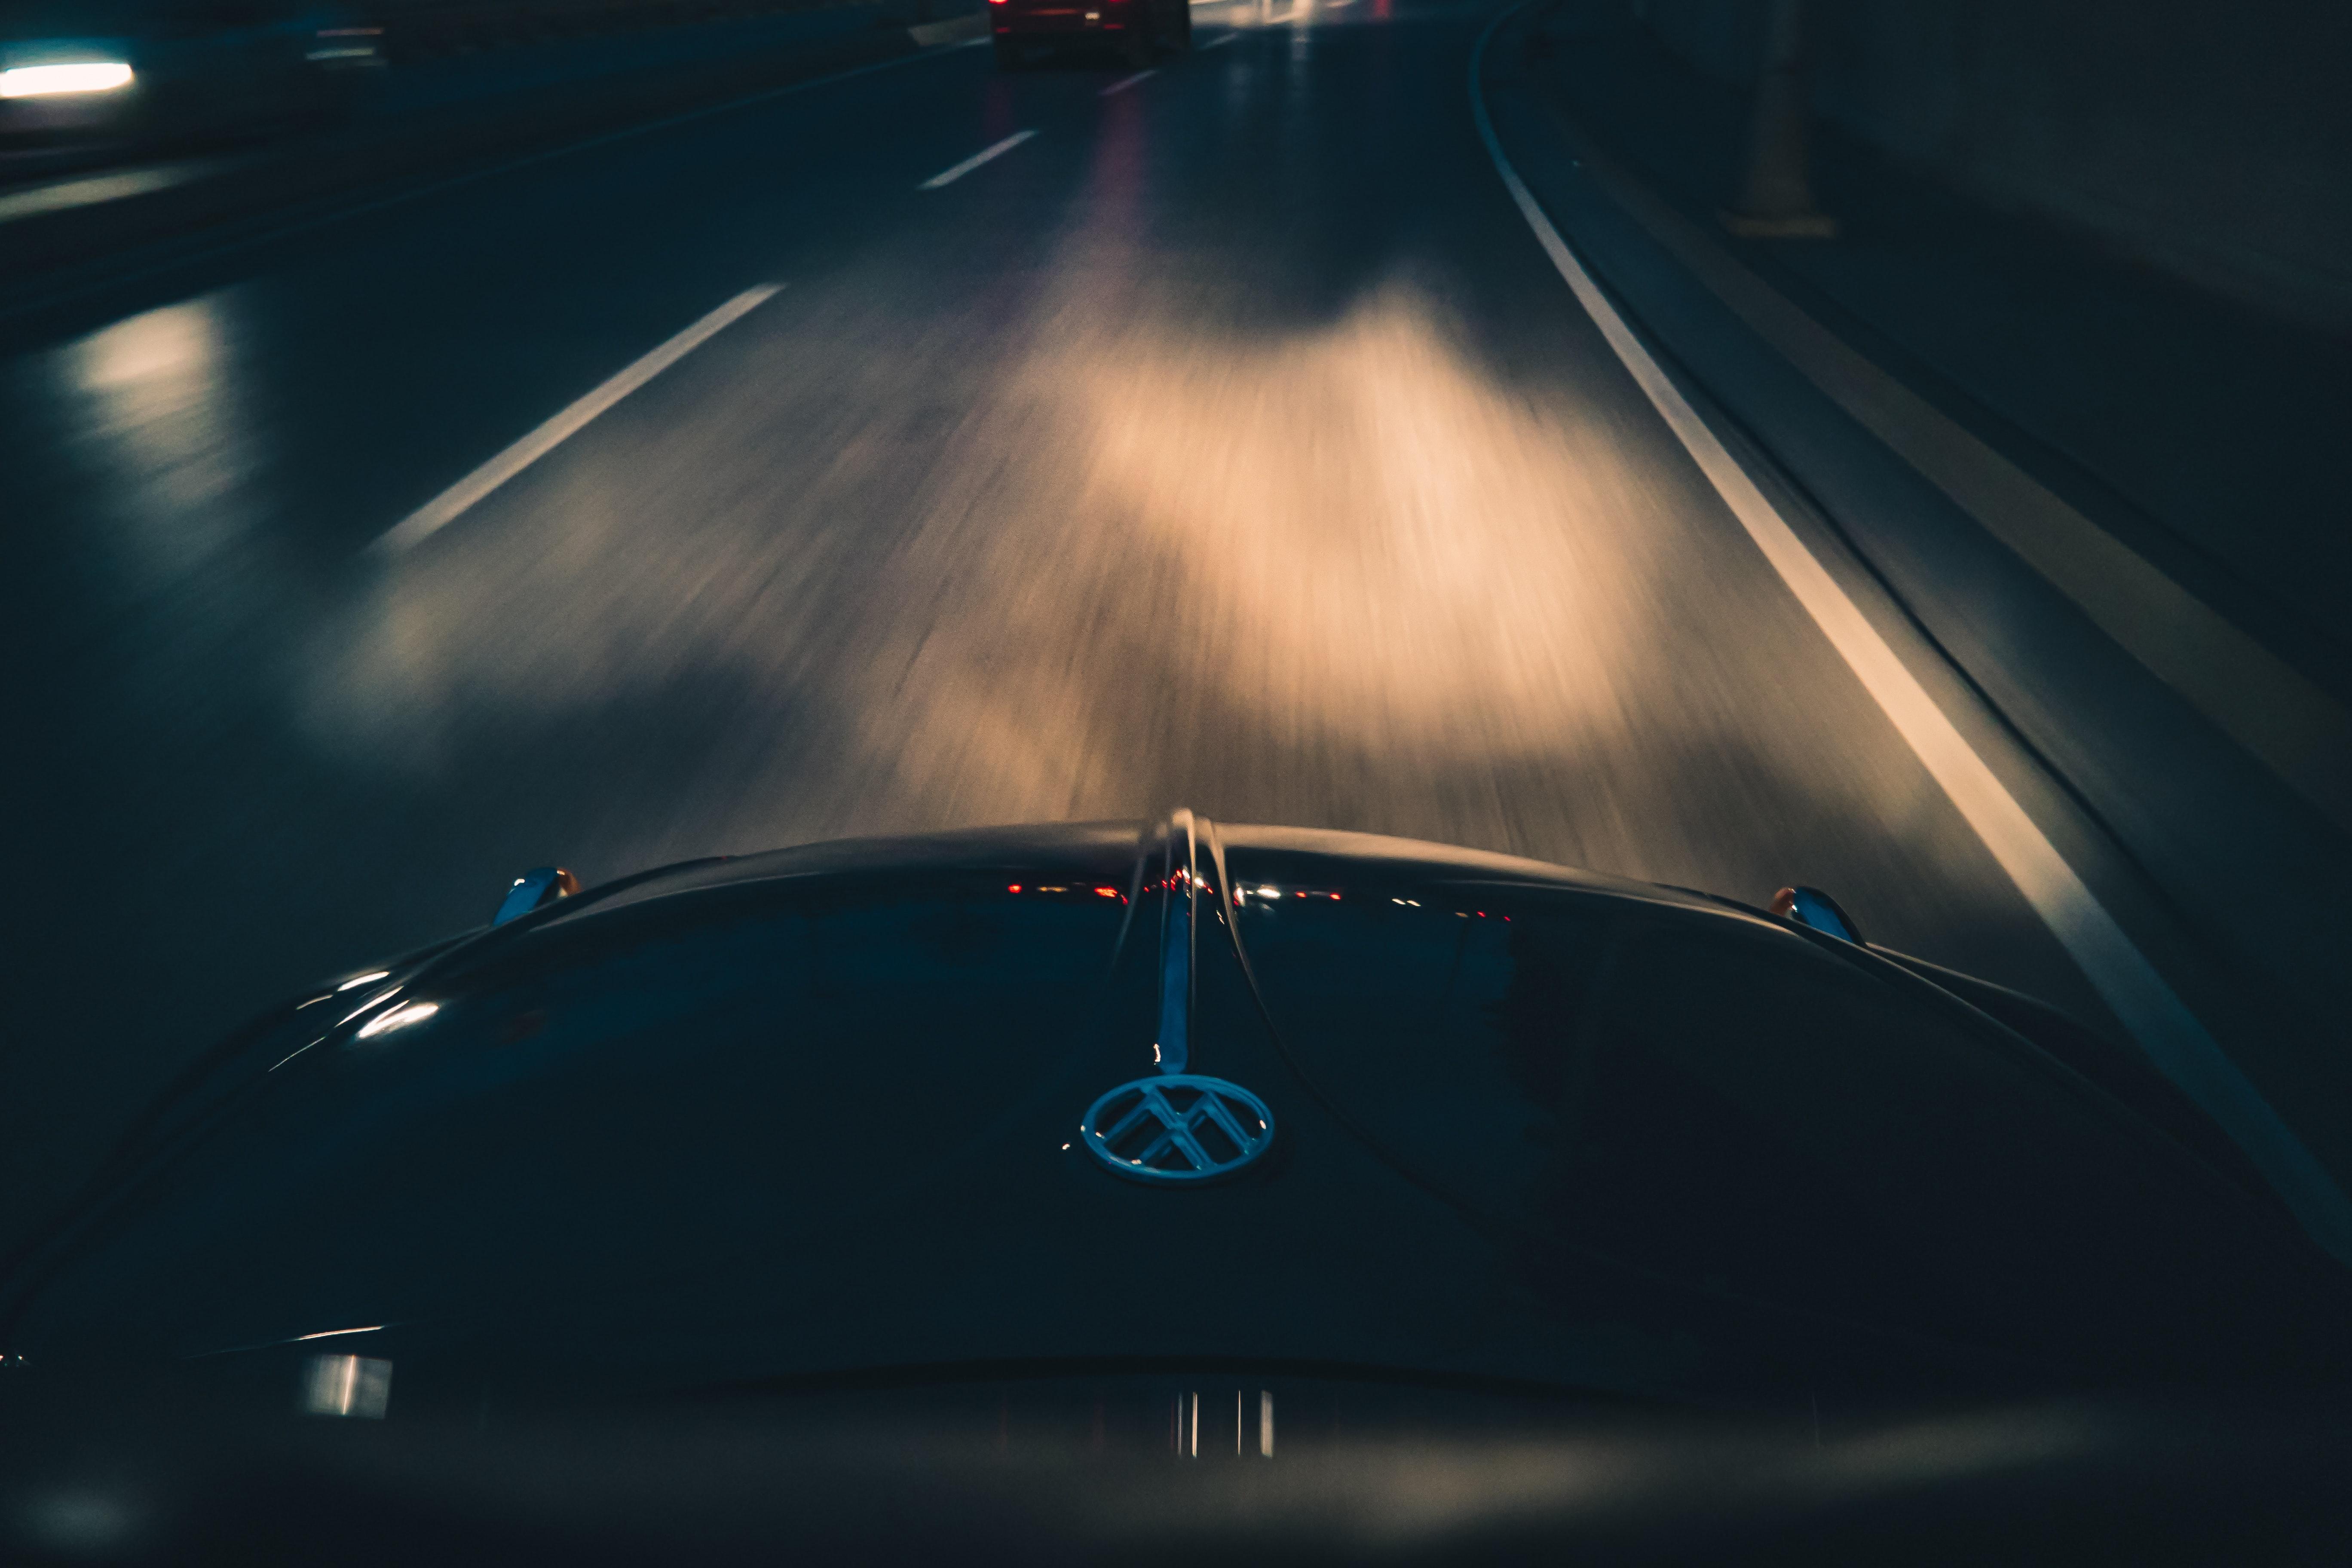 Black volkswagen car on gray asphalt road photo